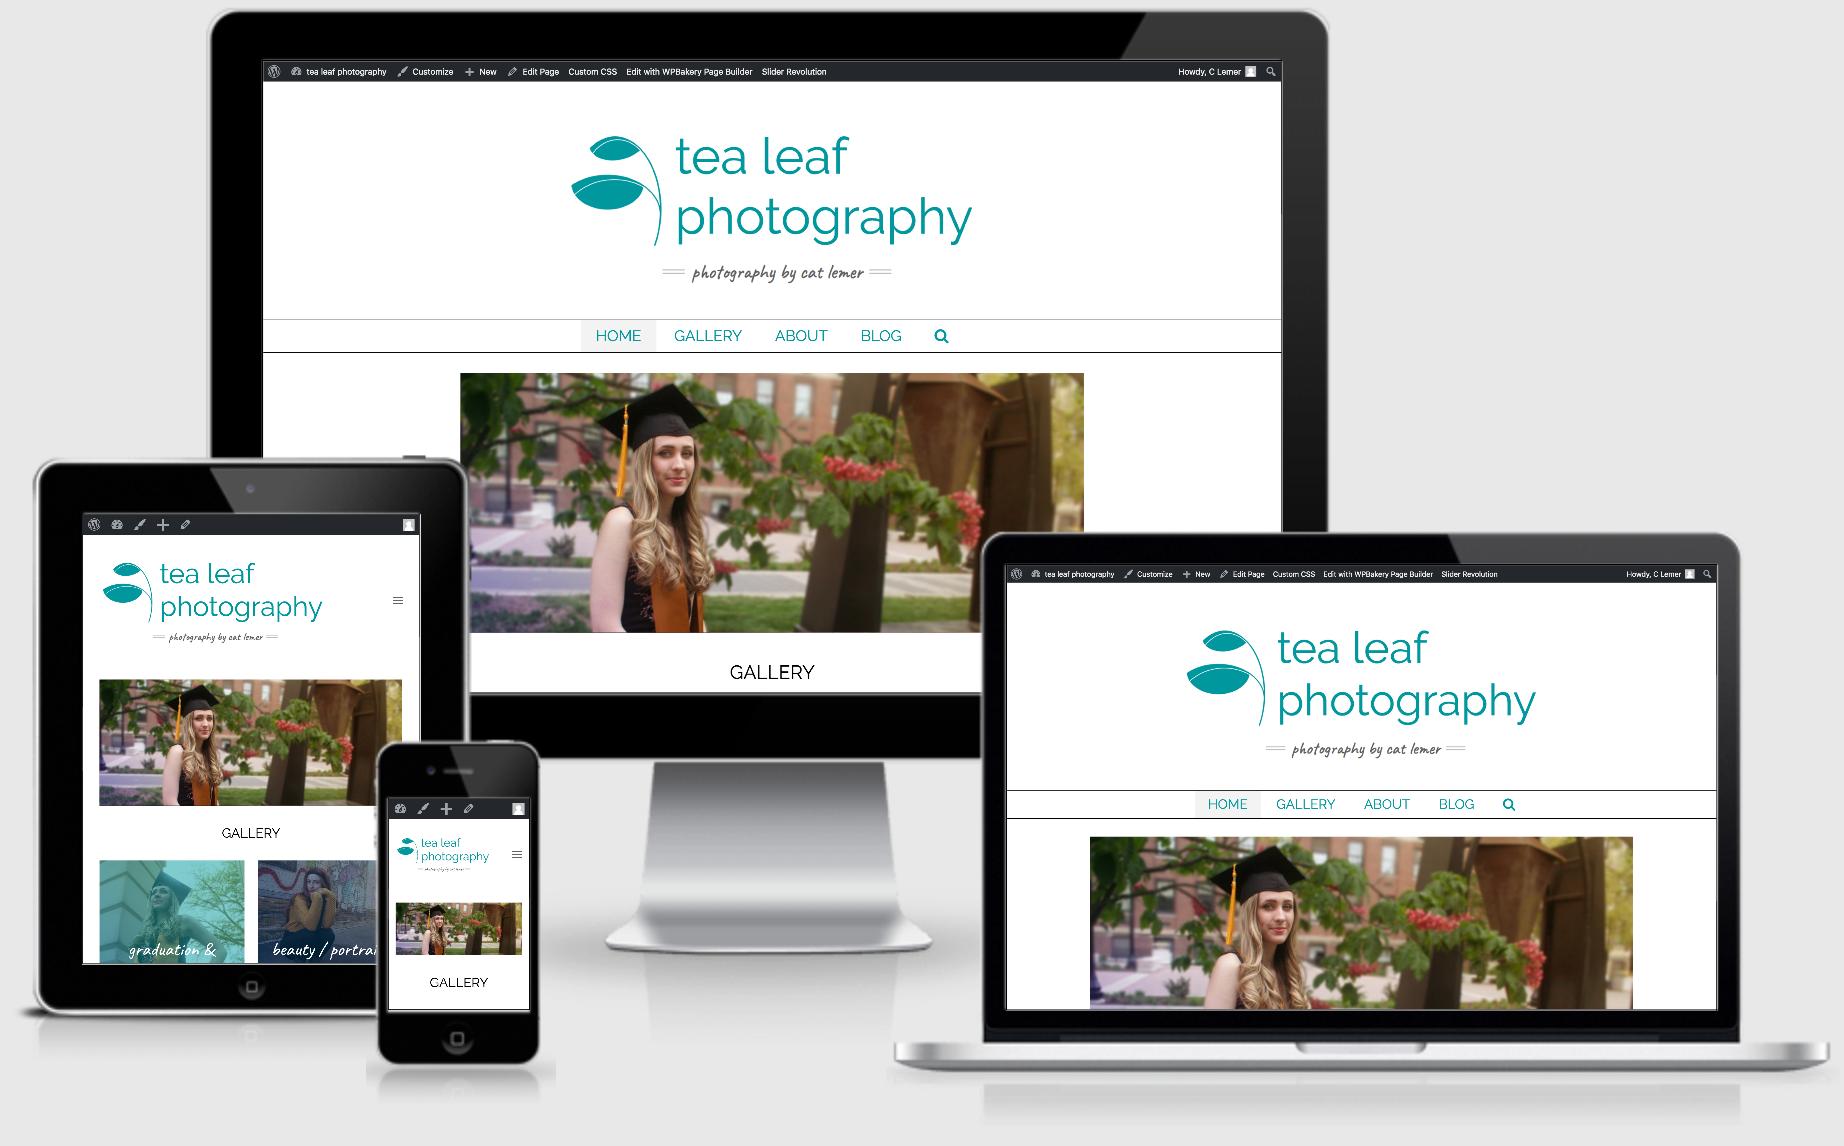 tea leaf photography responsive website homepage image